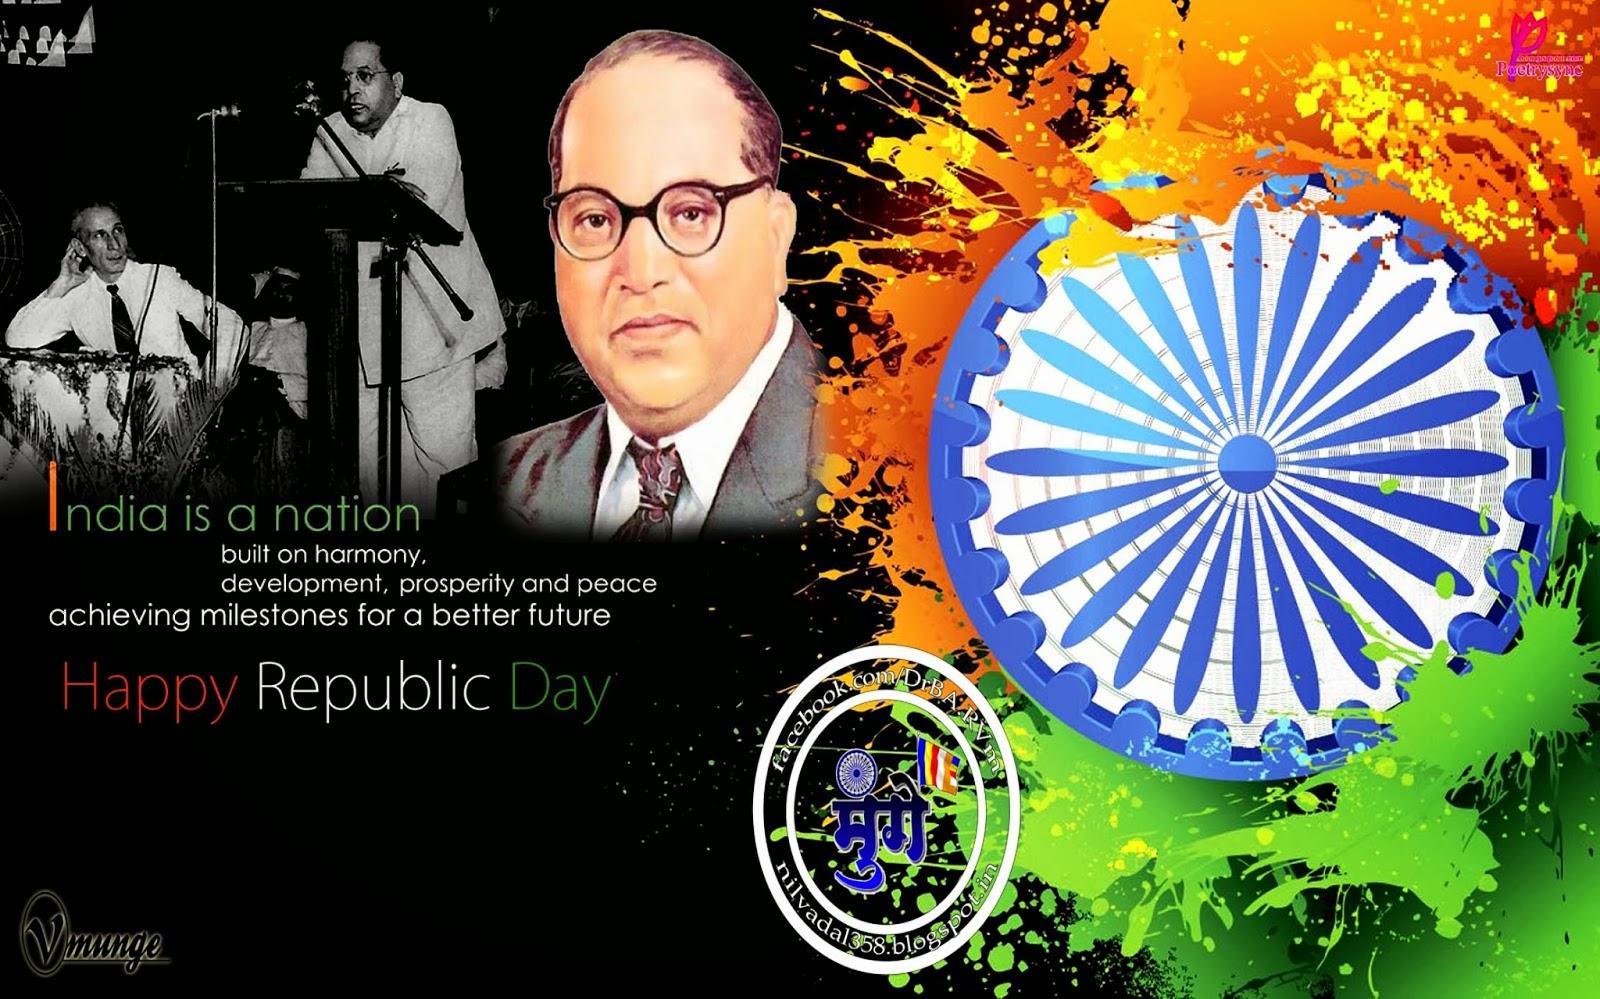 Happy-Republic-Day-Wallpaper-26-Jan-Republic-Day-of-India-Greetings ...